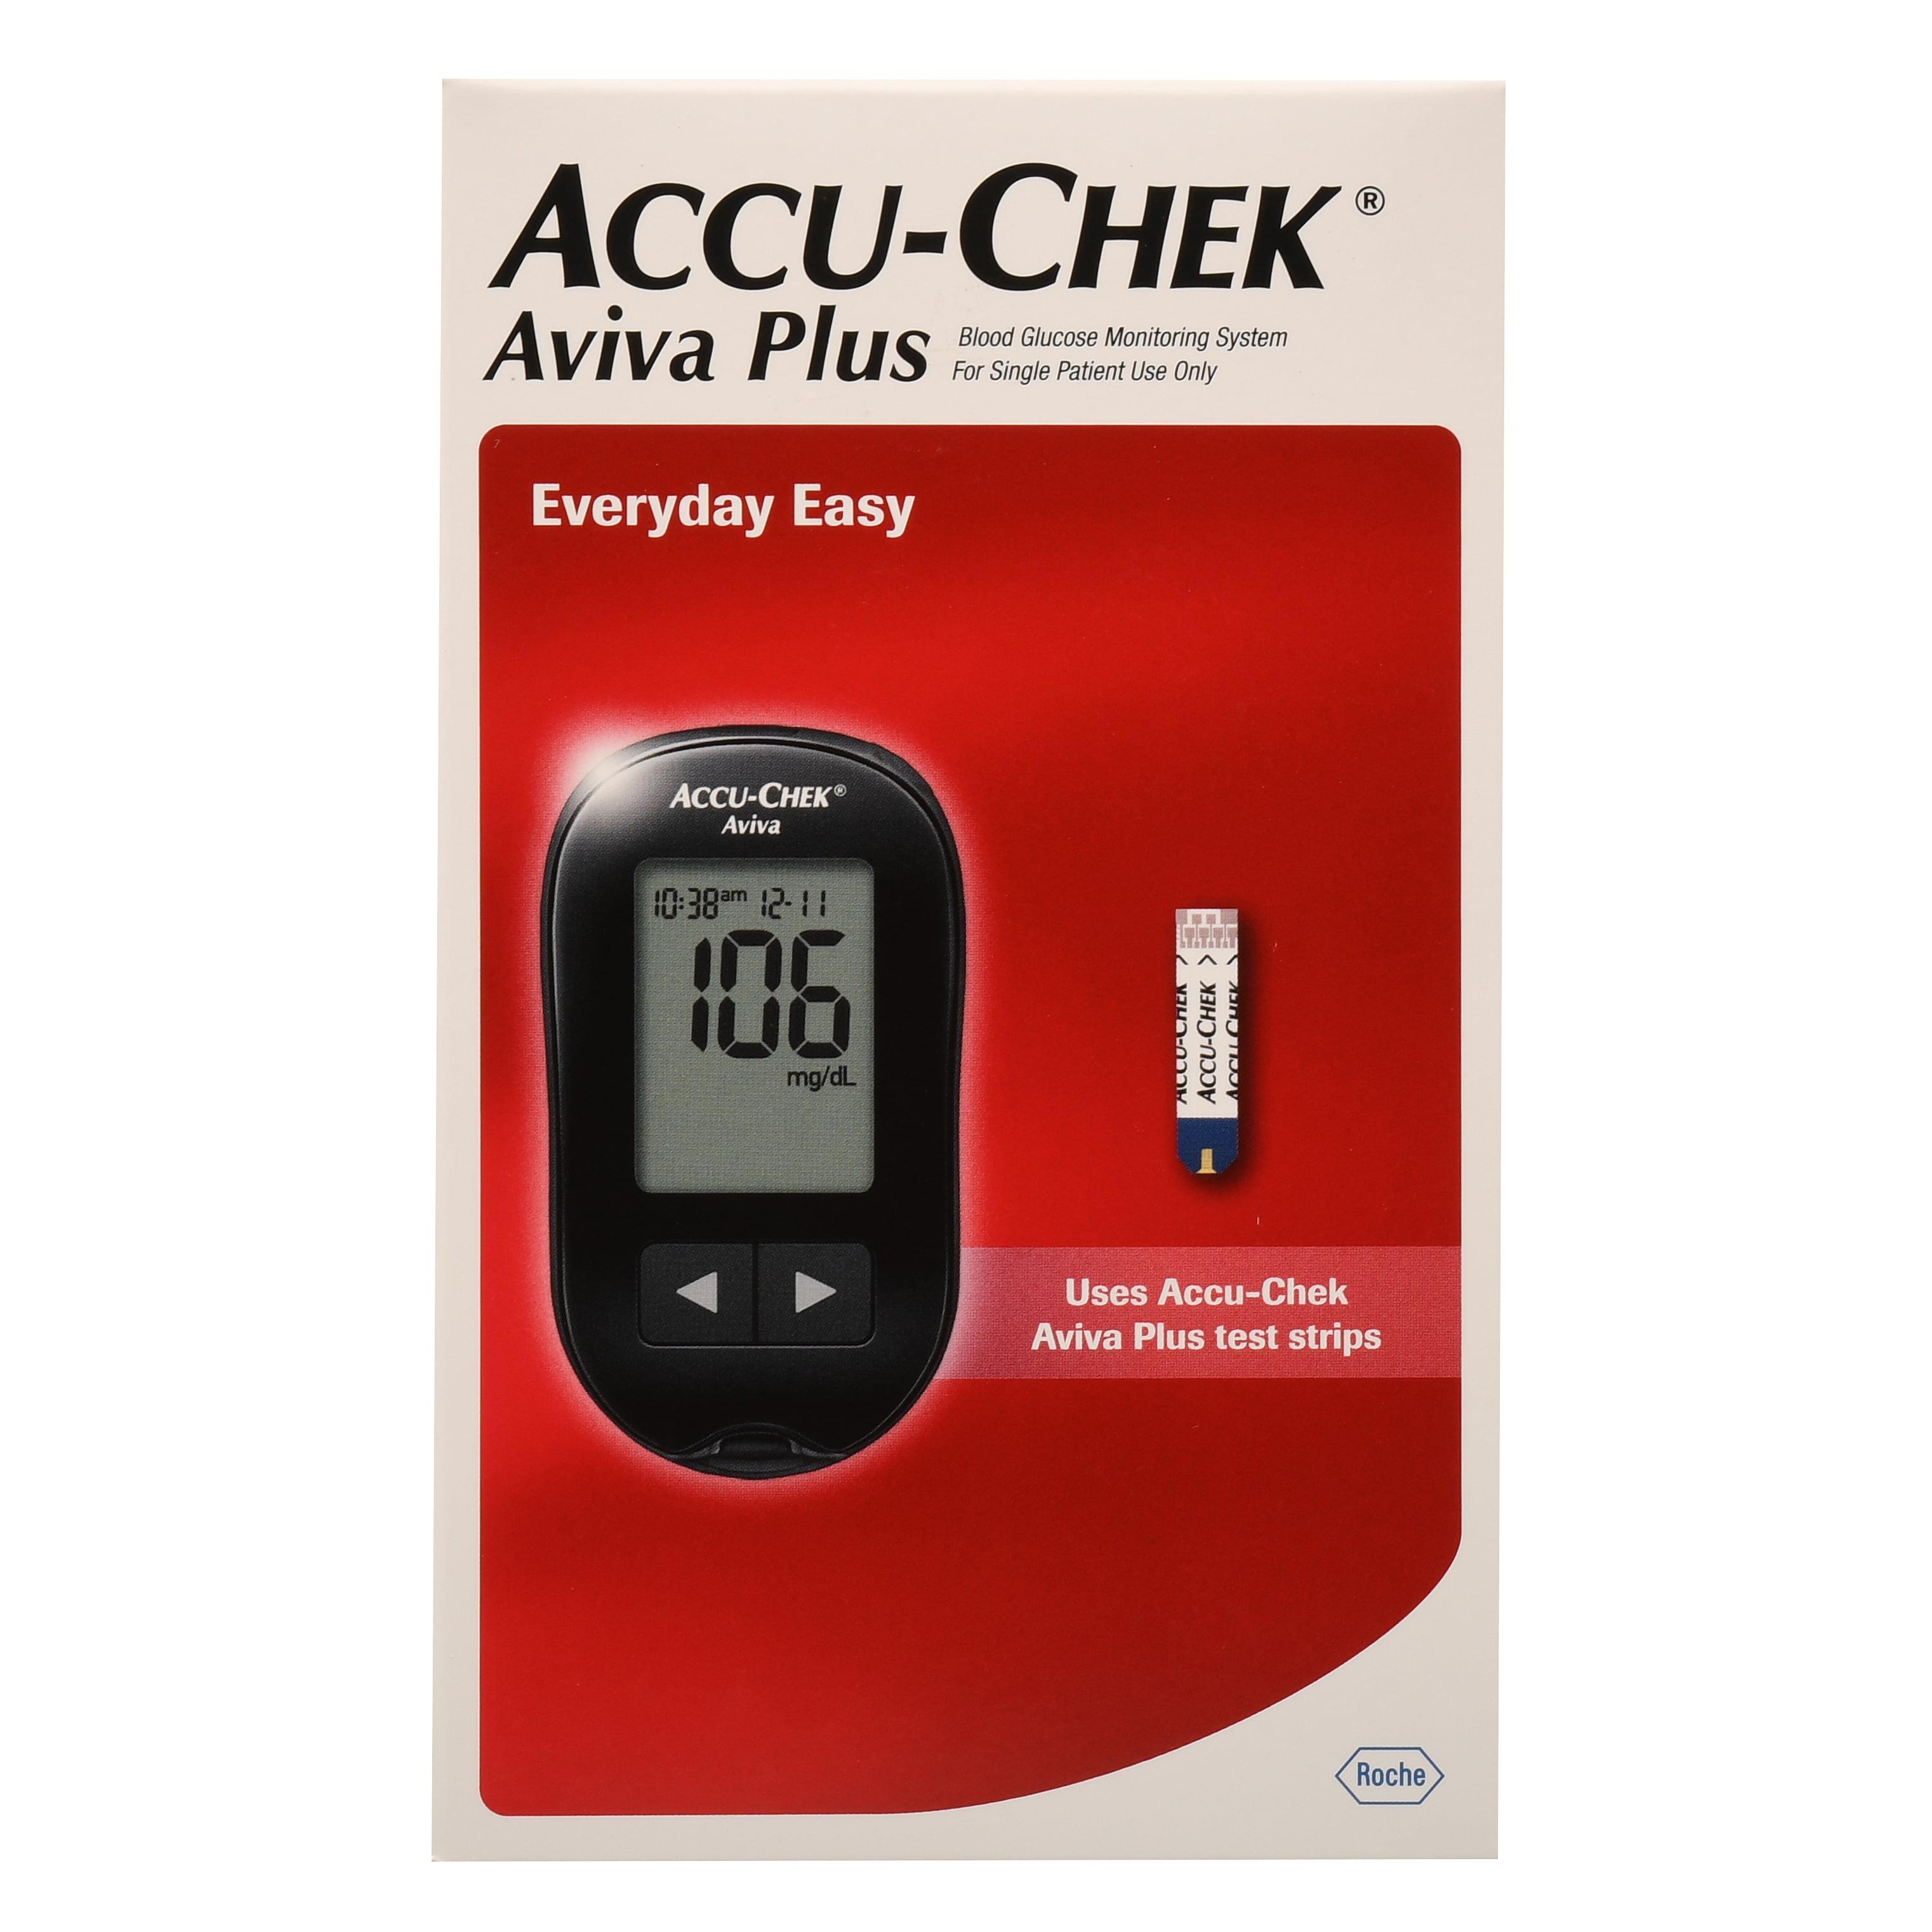 Accu-Chek Aviva Plus Meter 365702723108A2532